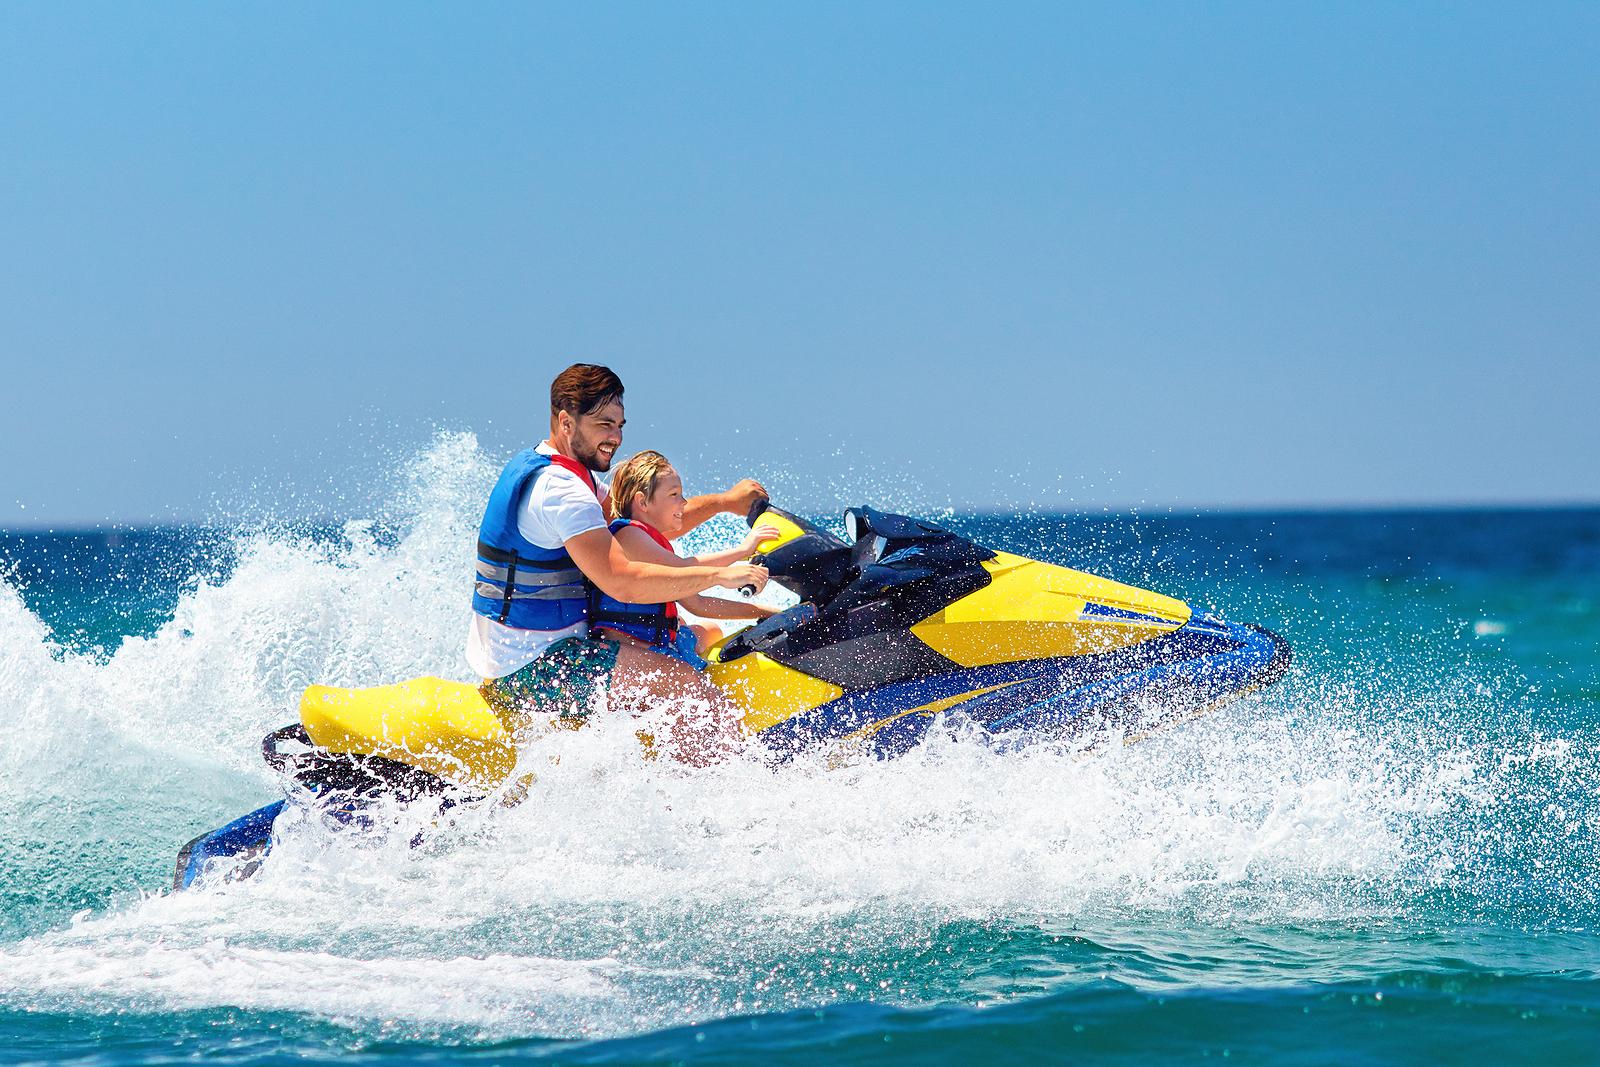 Family on bright yellow jet ski doing tricks on water